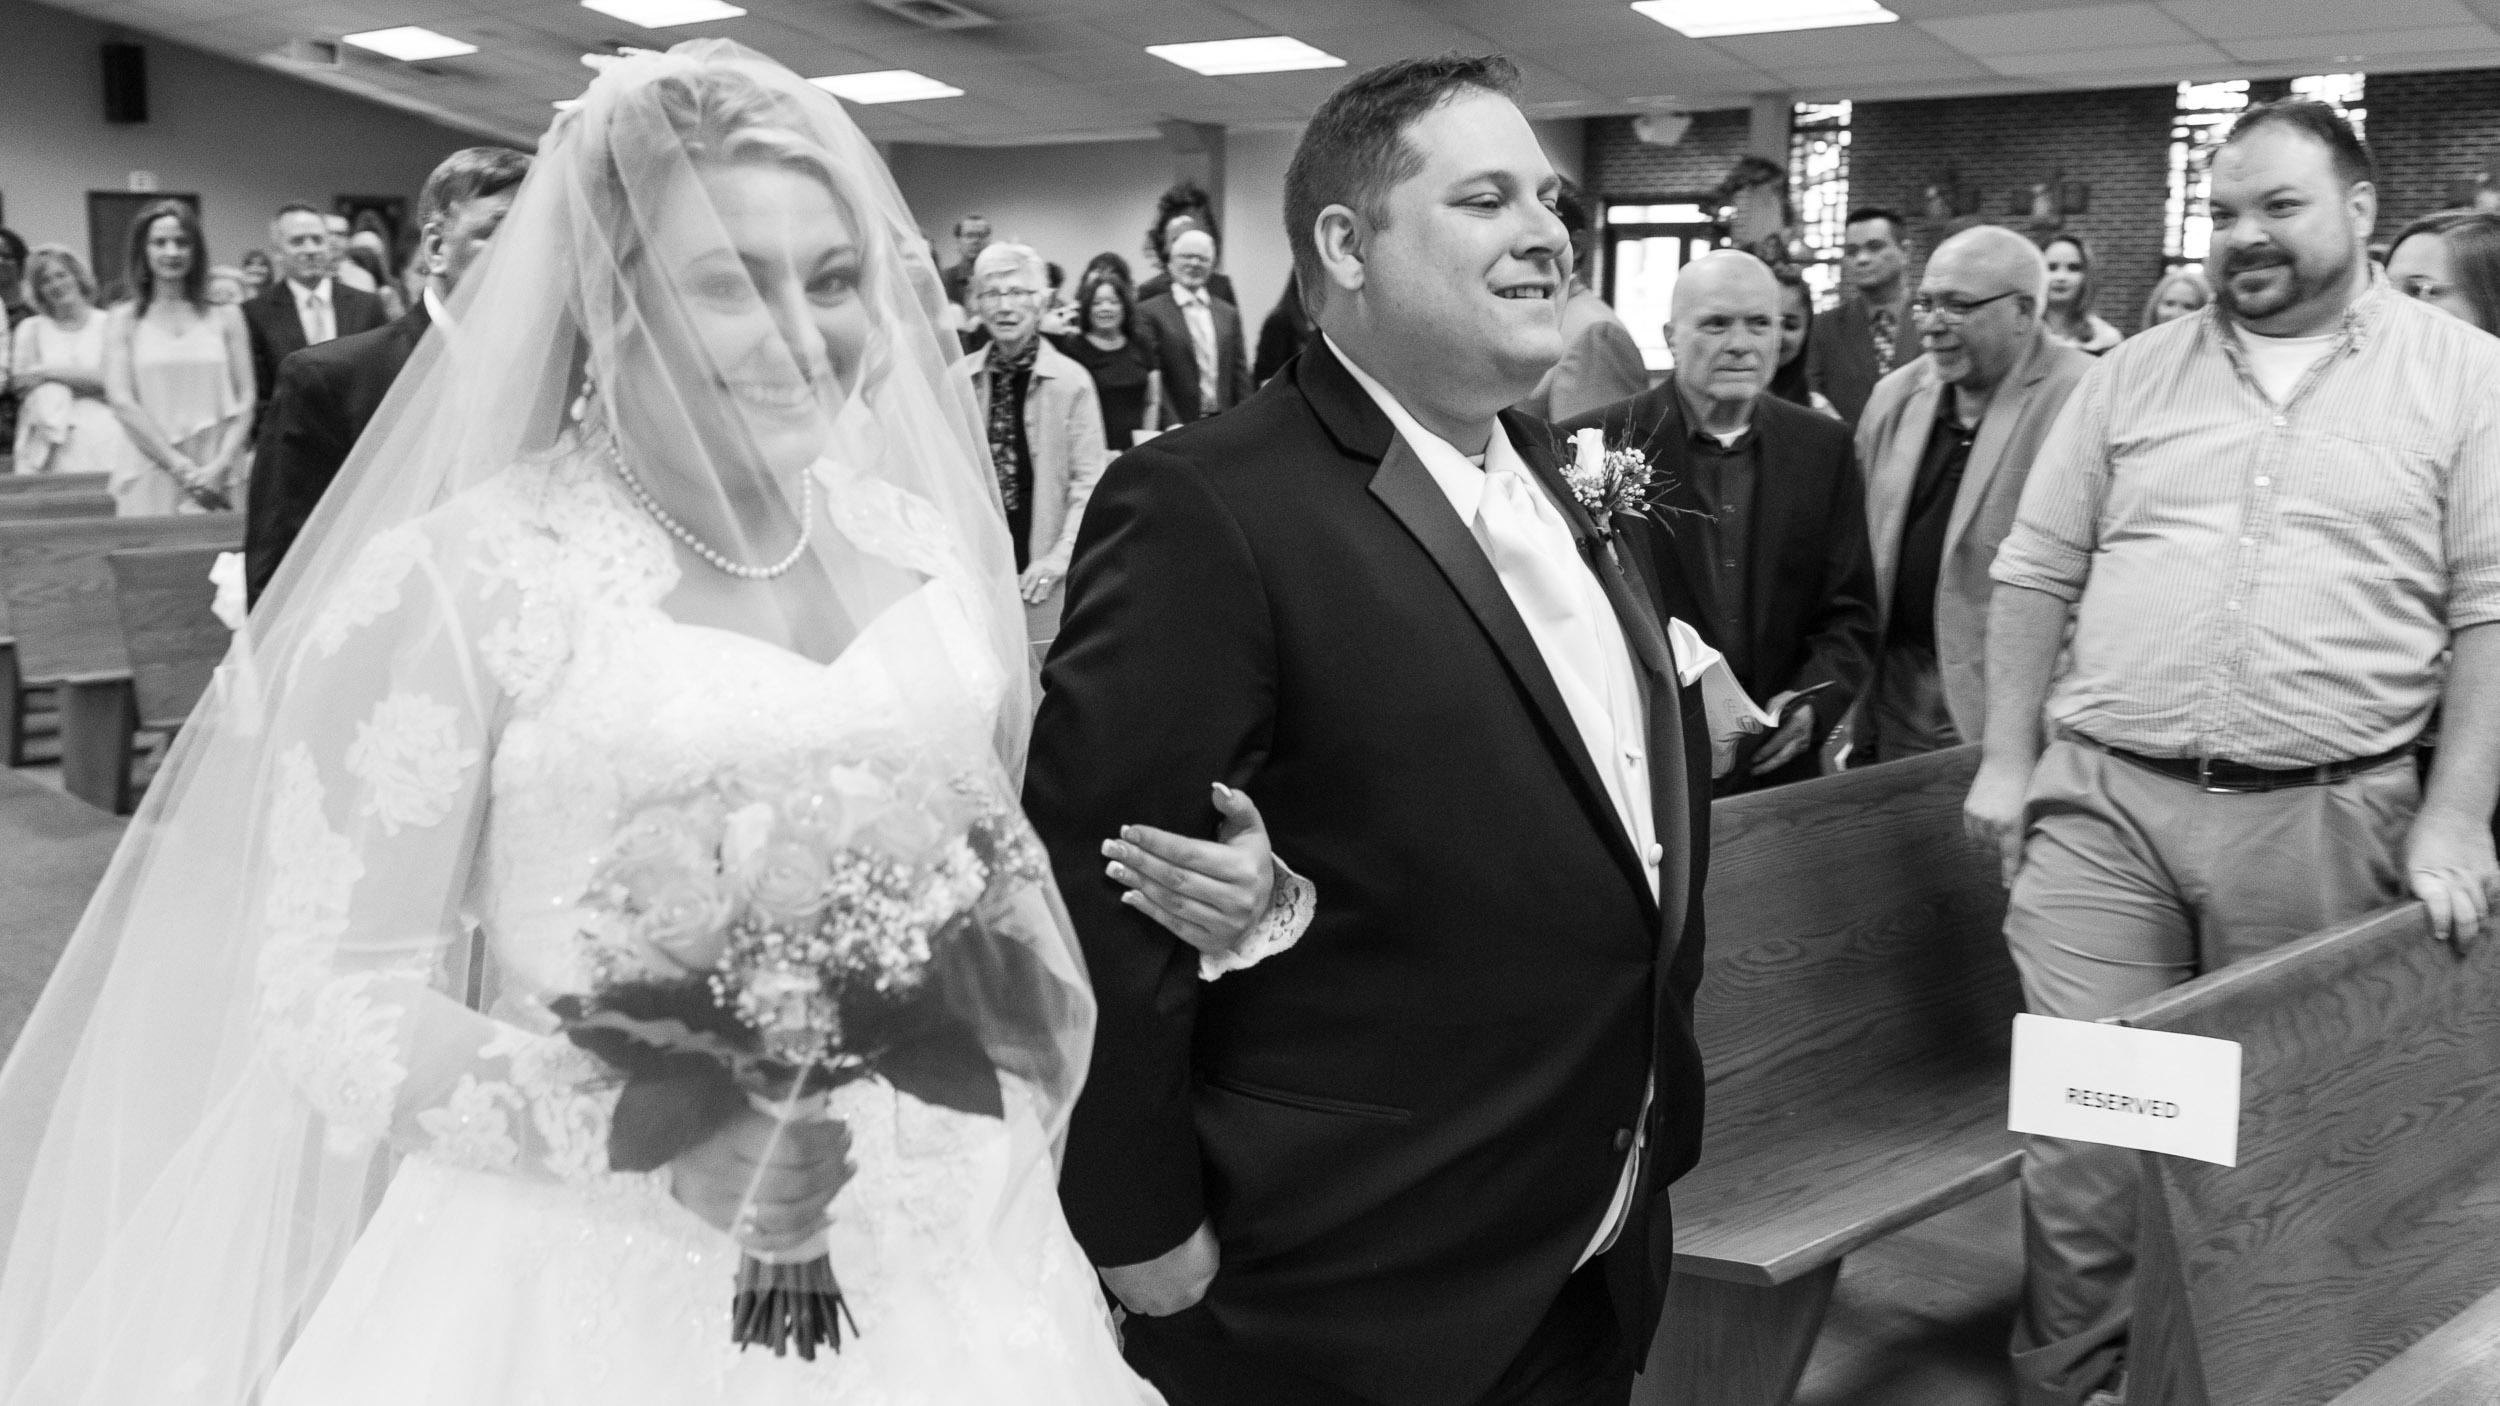 Wedding-Ceremony-Bride-and-Groom-2.jpg